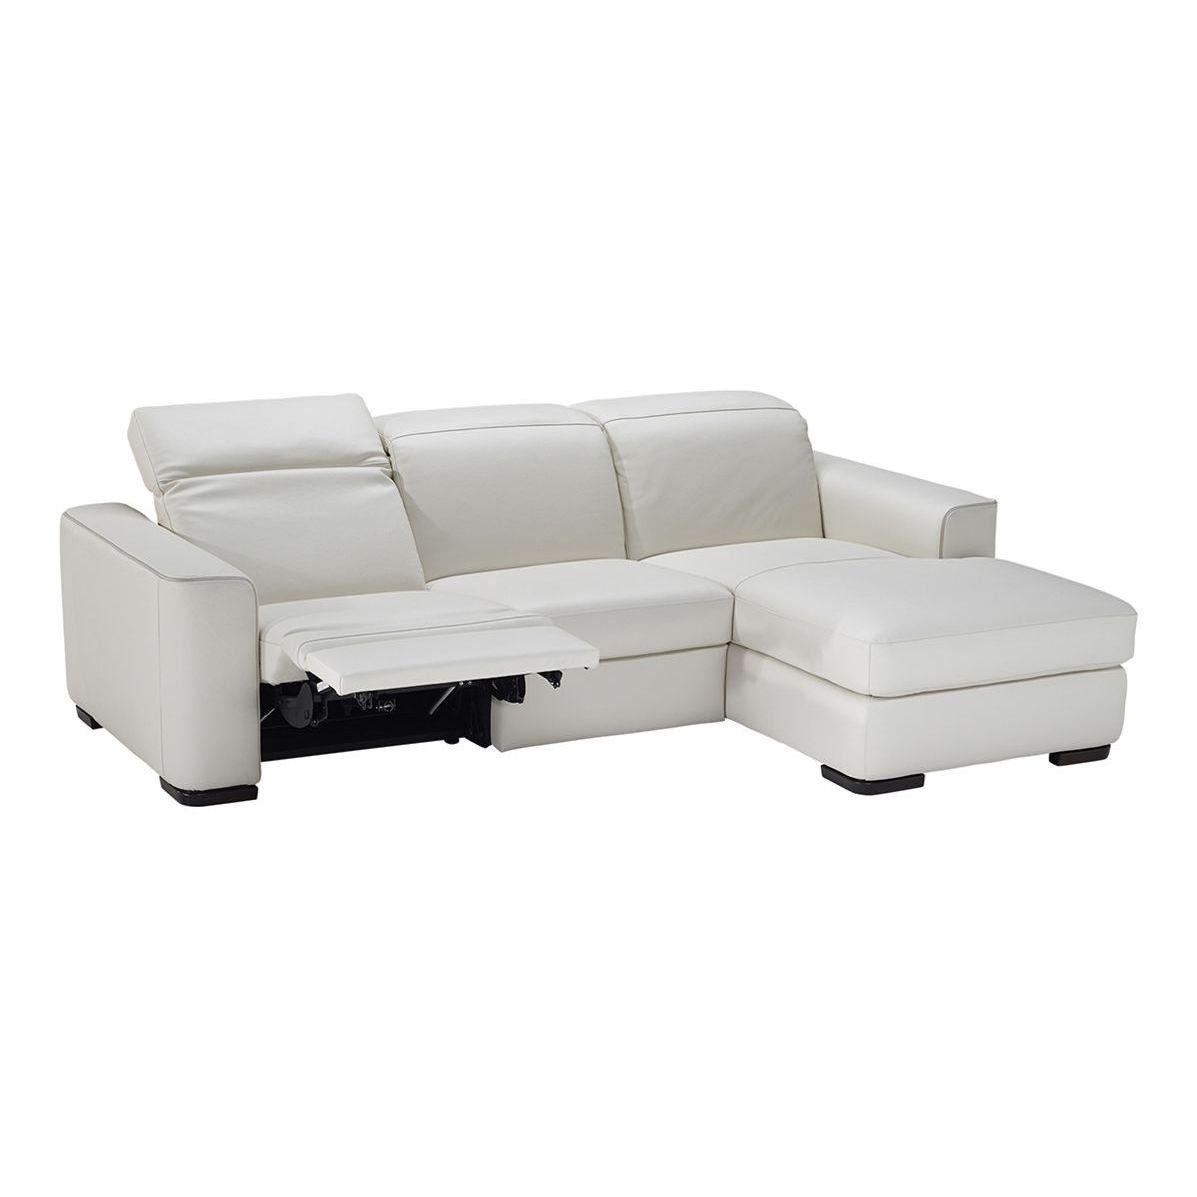 Sofa En Ingles Versatile Sofa Hip Furniture Sofa Italia